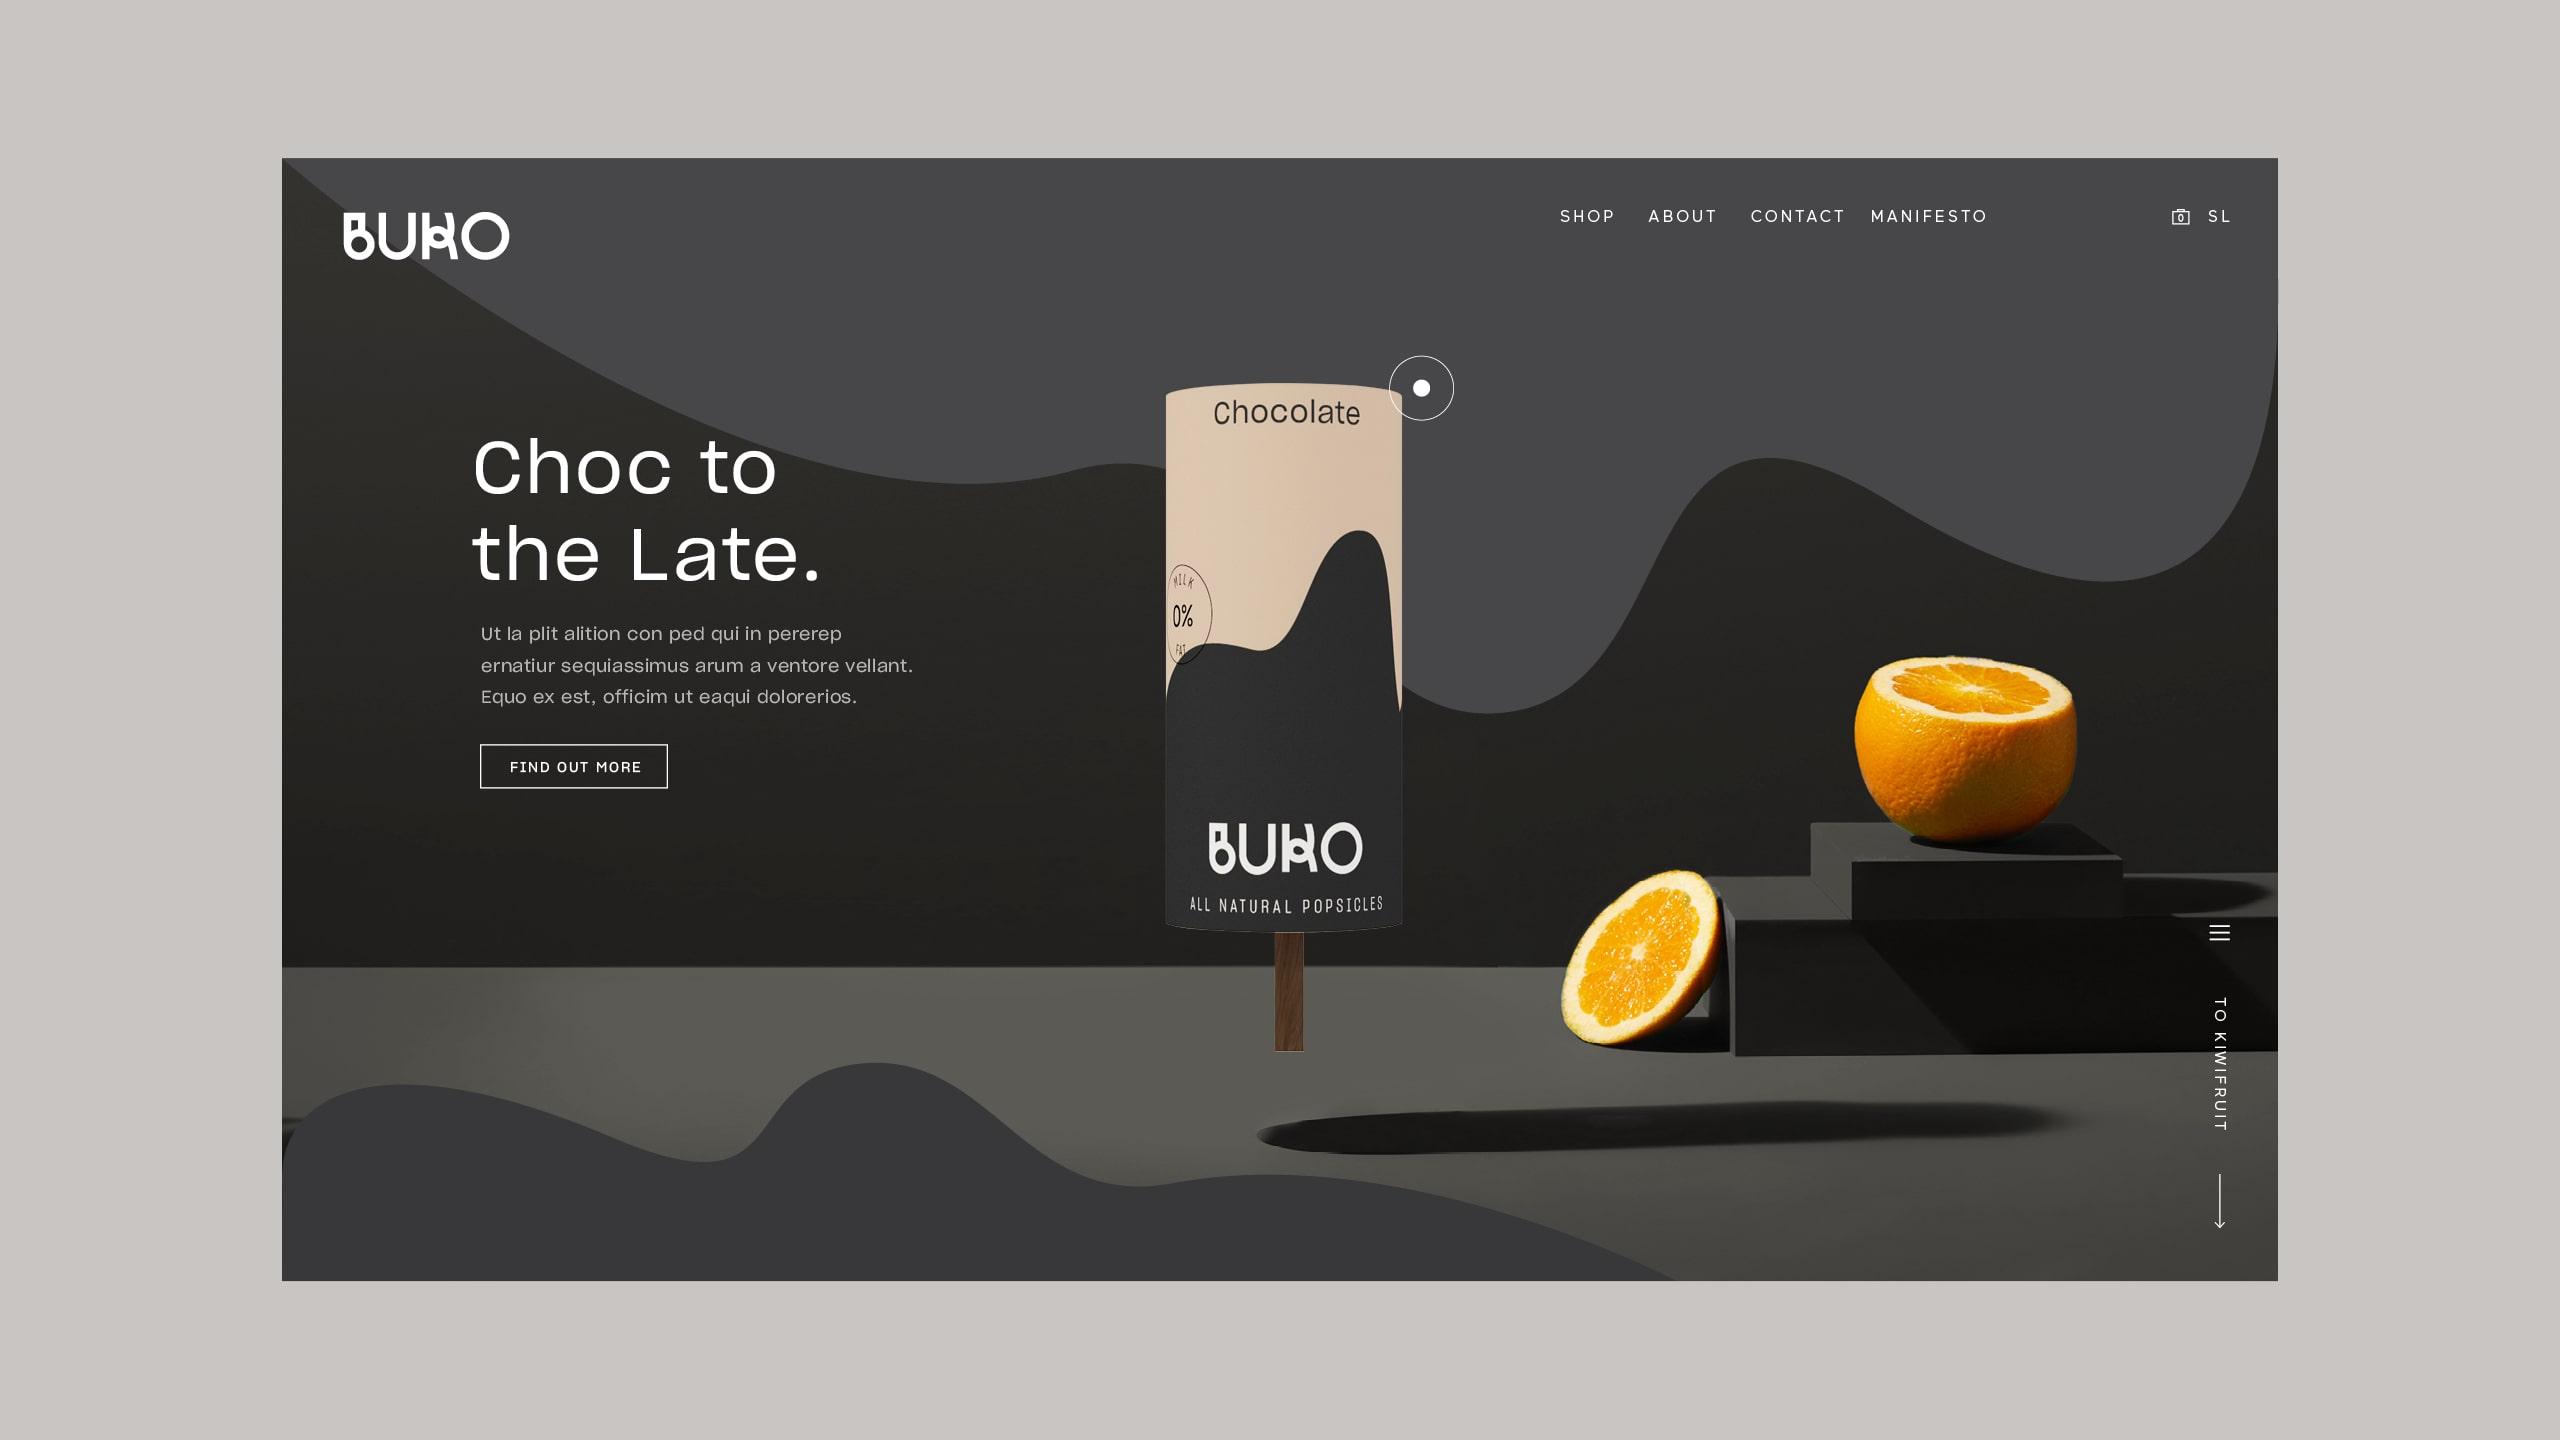 mantik-digital-creative-agency-branding-popsicle-icecream-packaging-experience-web-design-development15-min